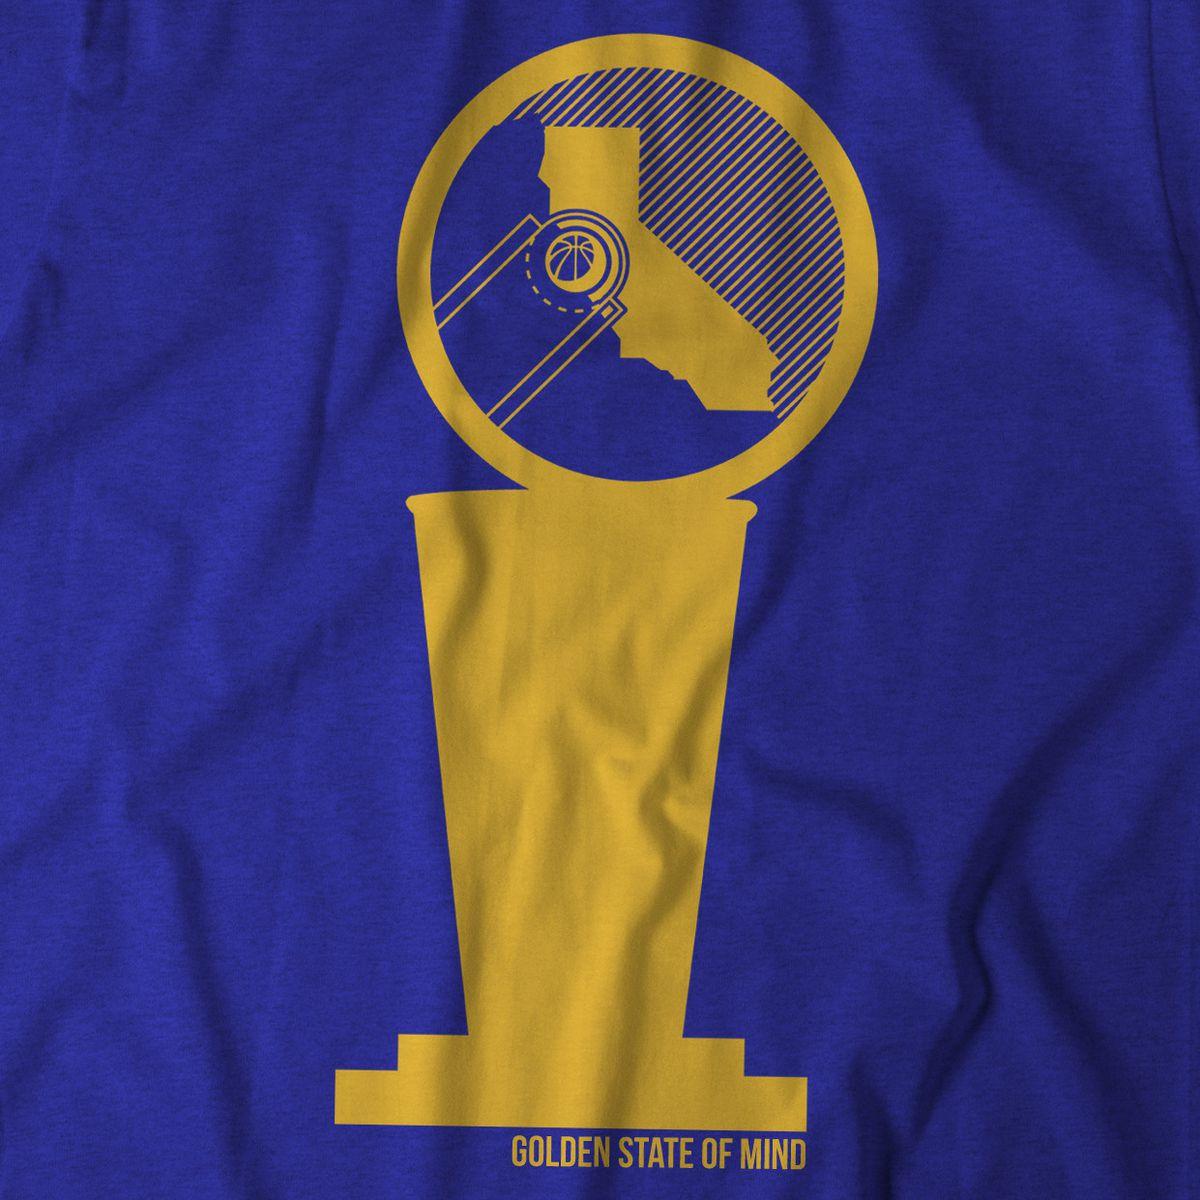 GSoM championship t-shirt